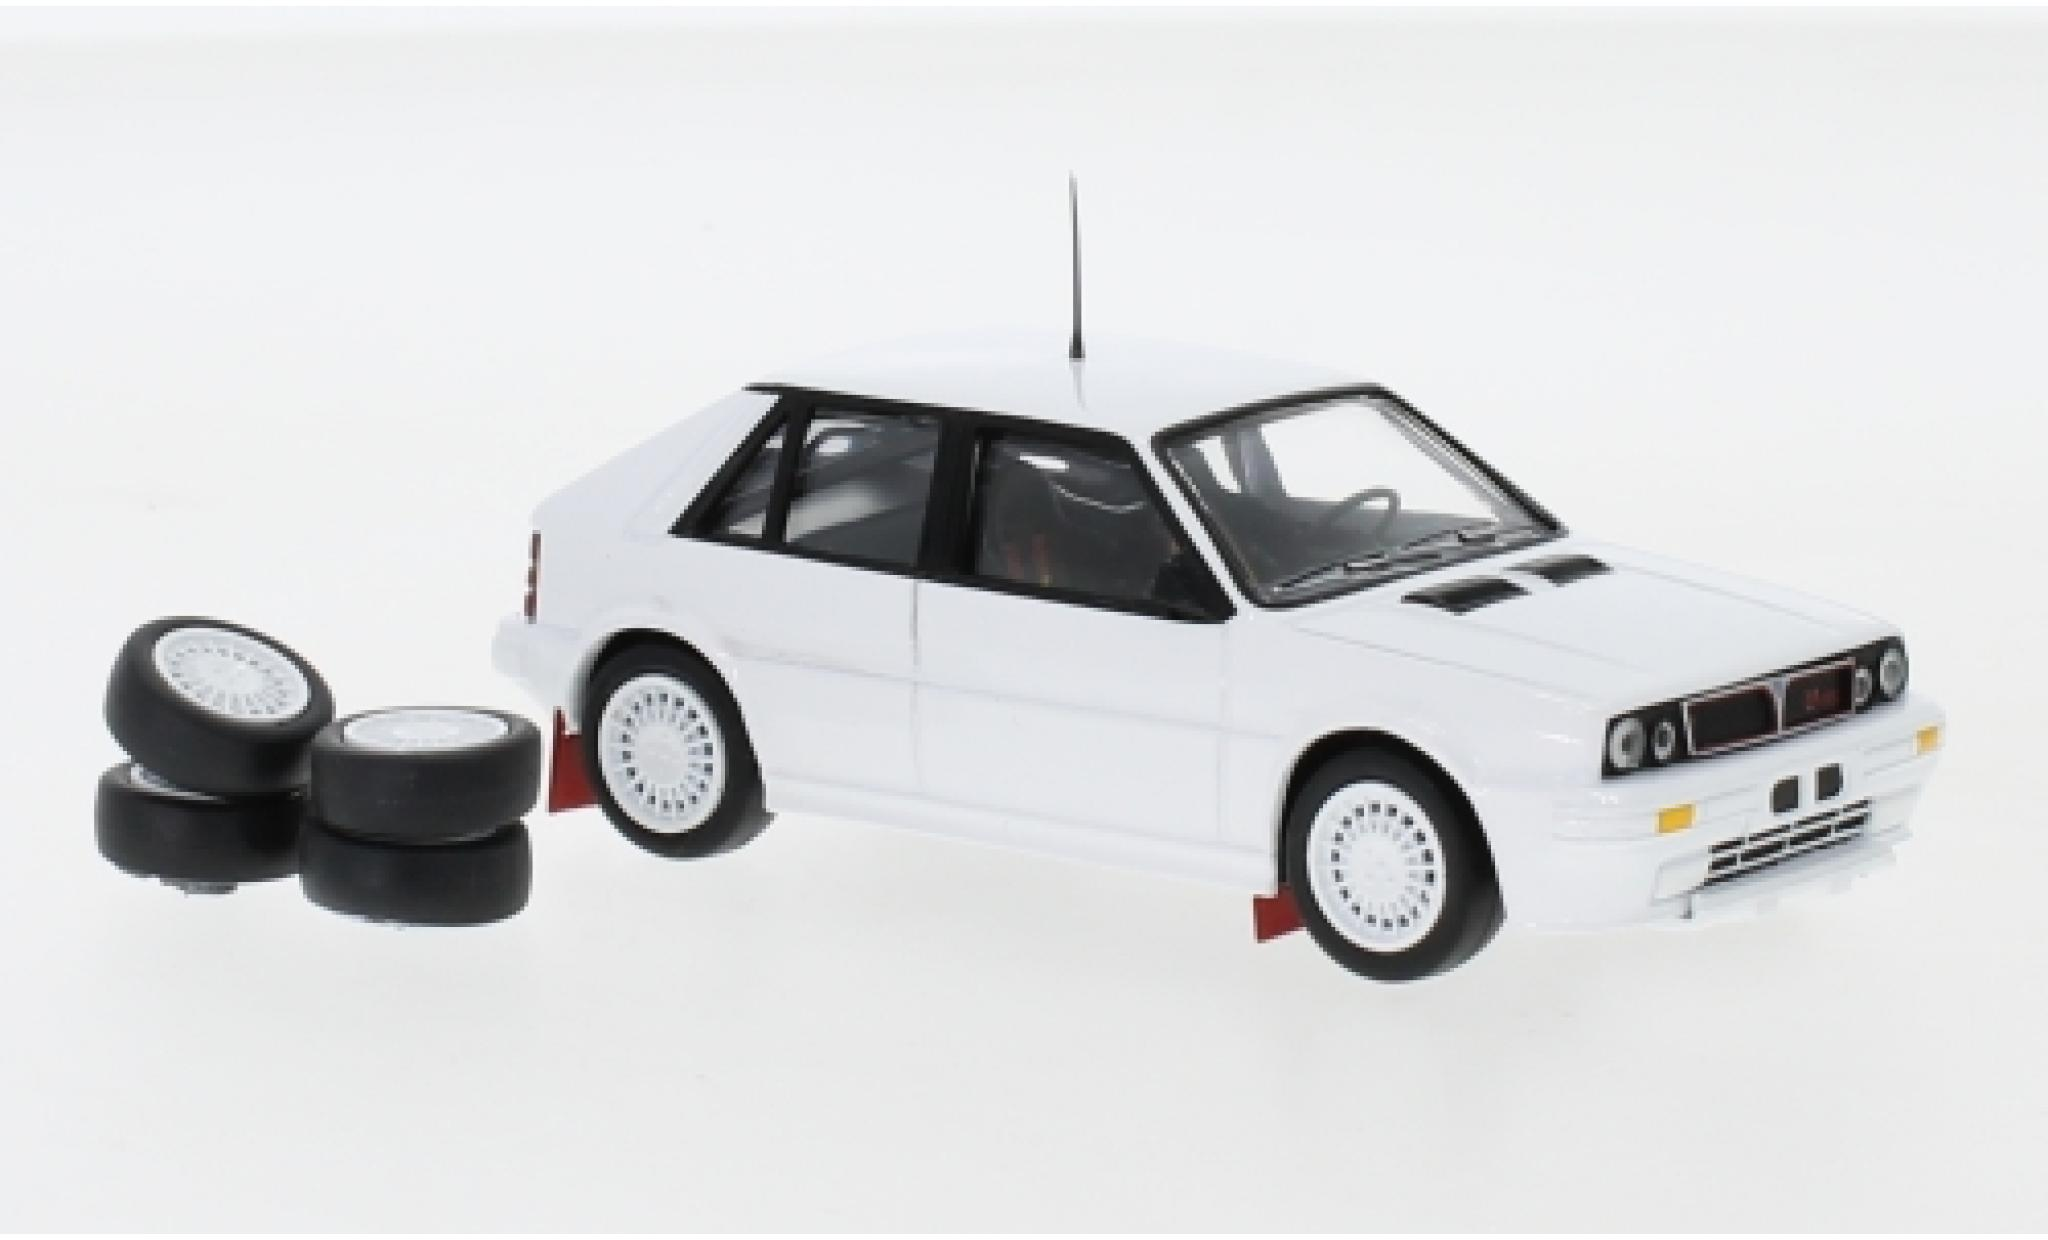 Lancia Delta 1/43 IXO HF Integrale 16V blanche 1989 Plain Body Version y compris les Zusatzteile